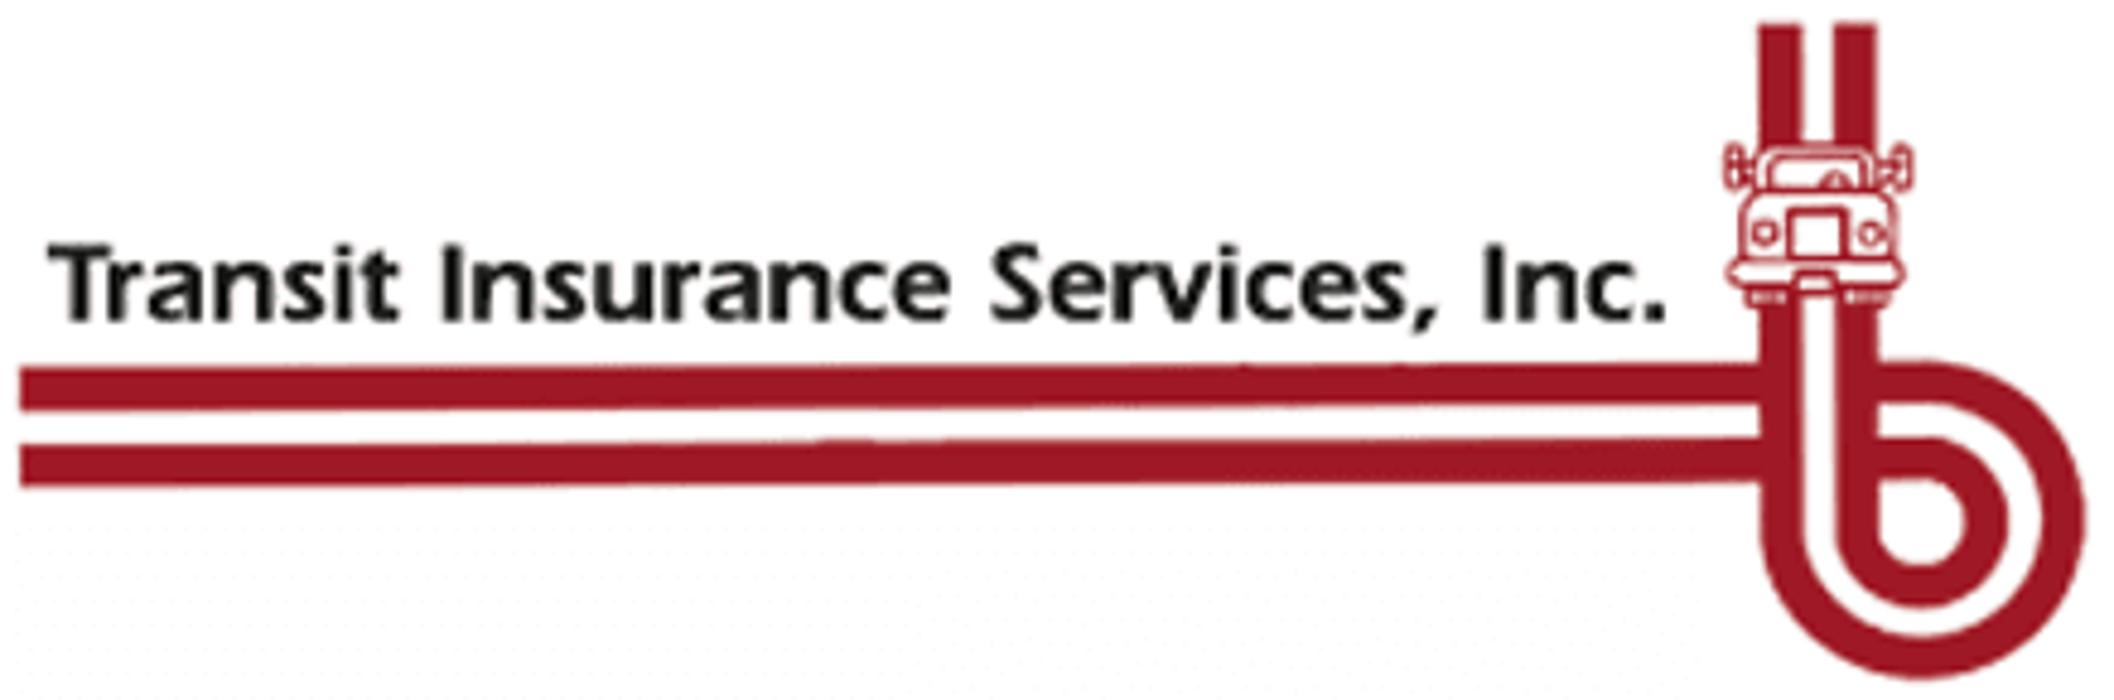 Transit Insurance Services - Ontario, CA